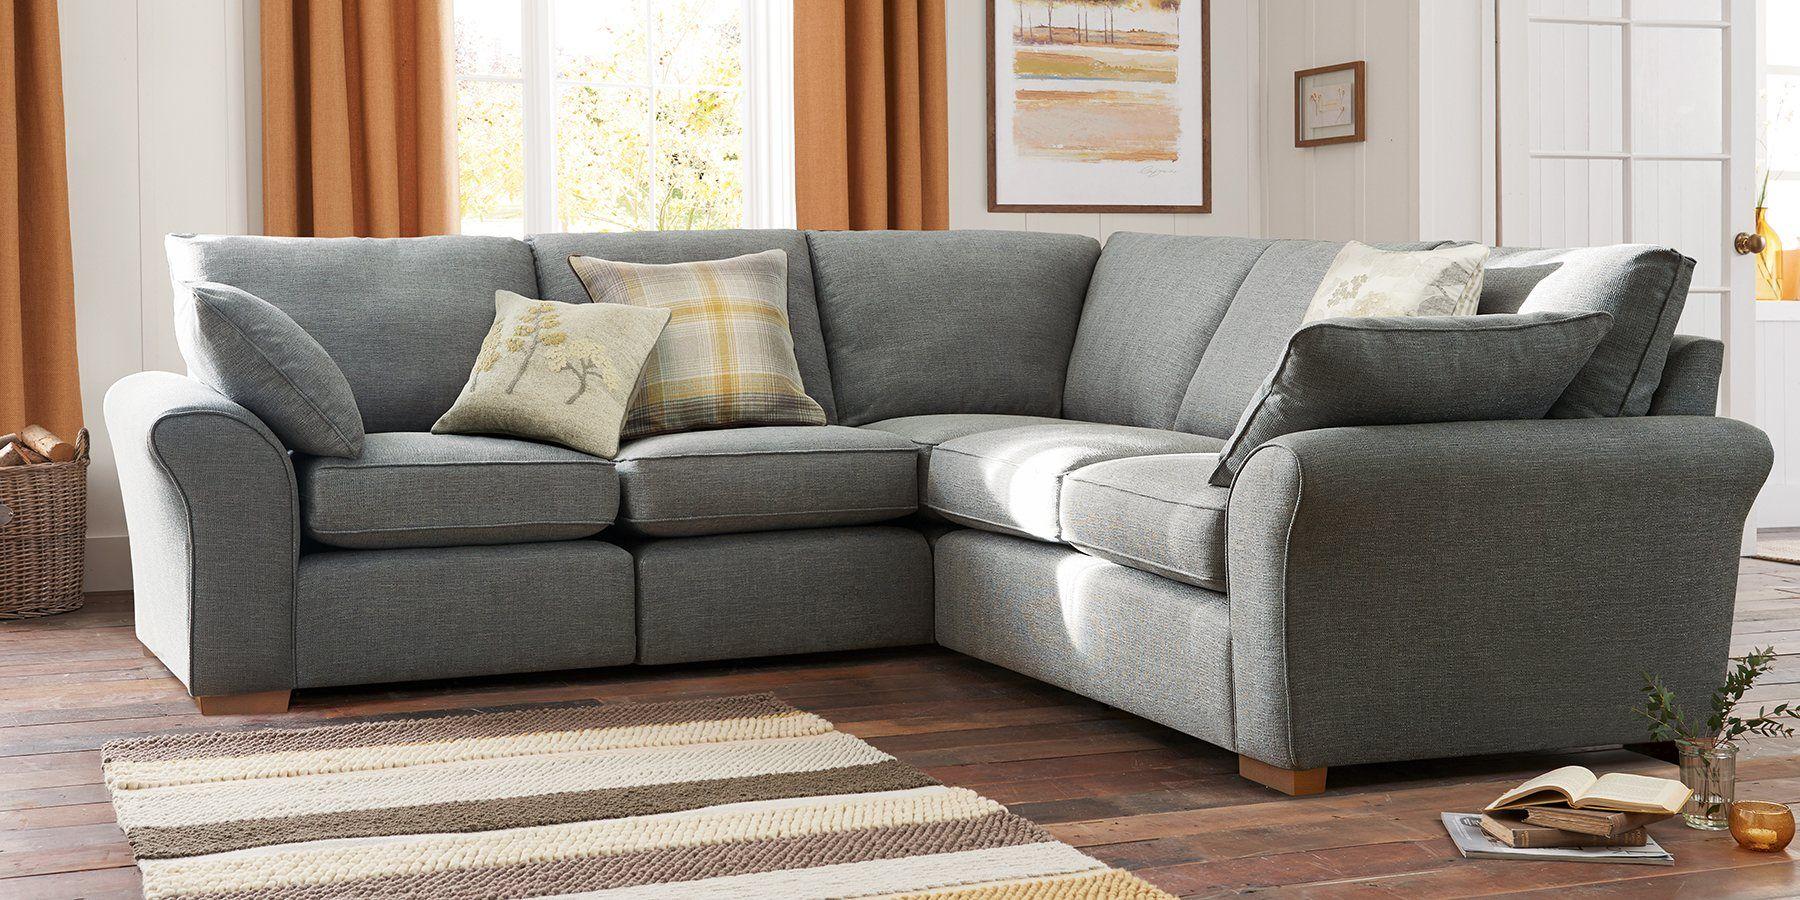 Buy Garda Modular Right Hand Double Seat Modular Textured Weave Mid Mink Block Sofa Home Corner Sofa Grey Corner Sofa